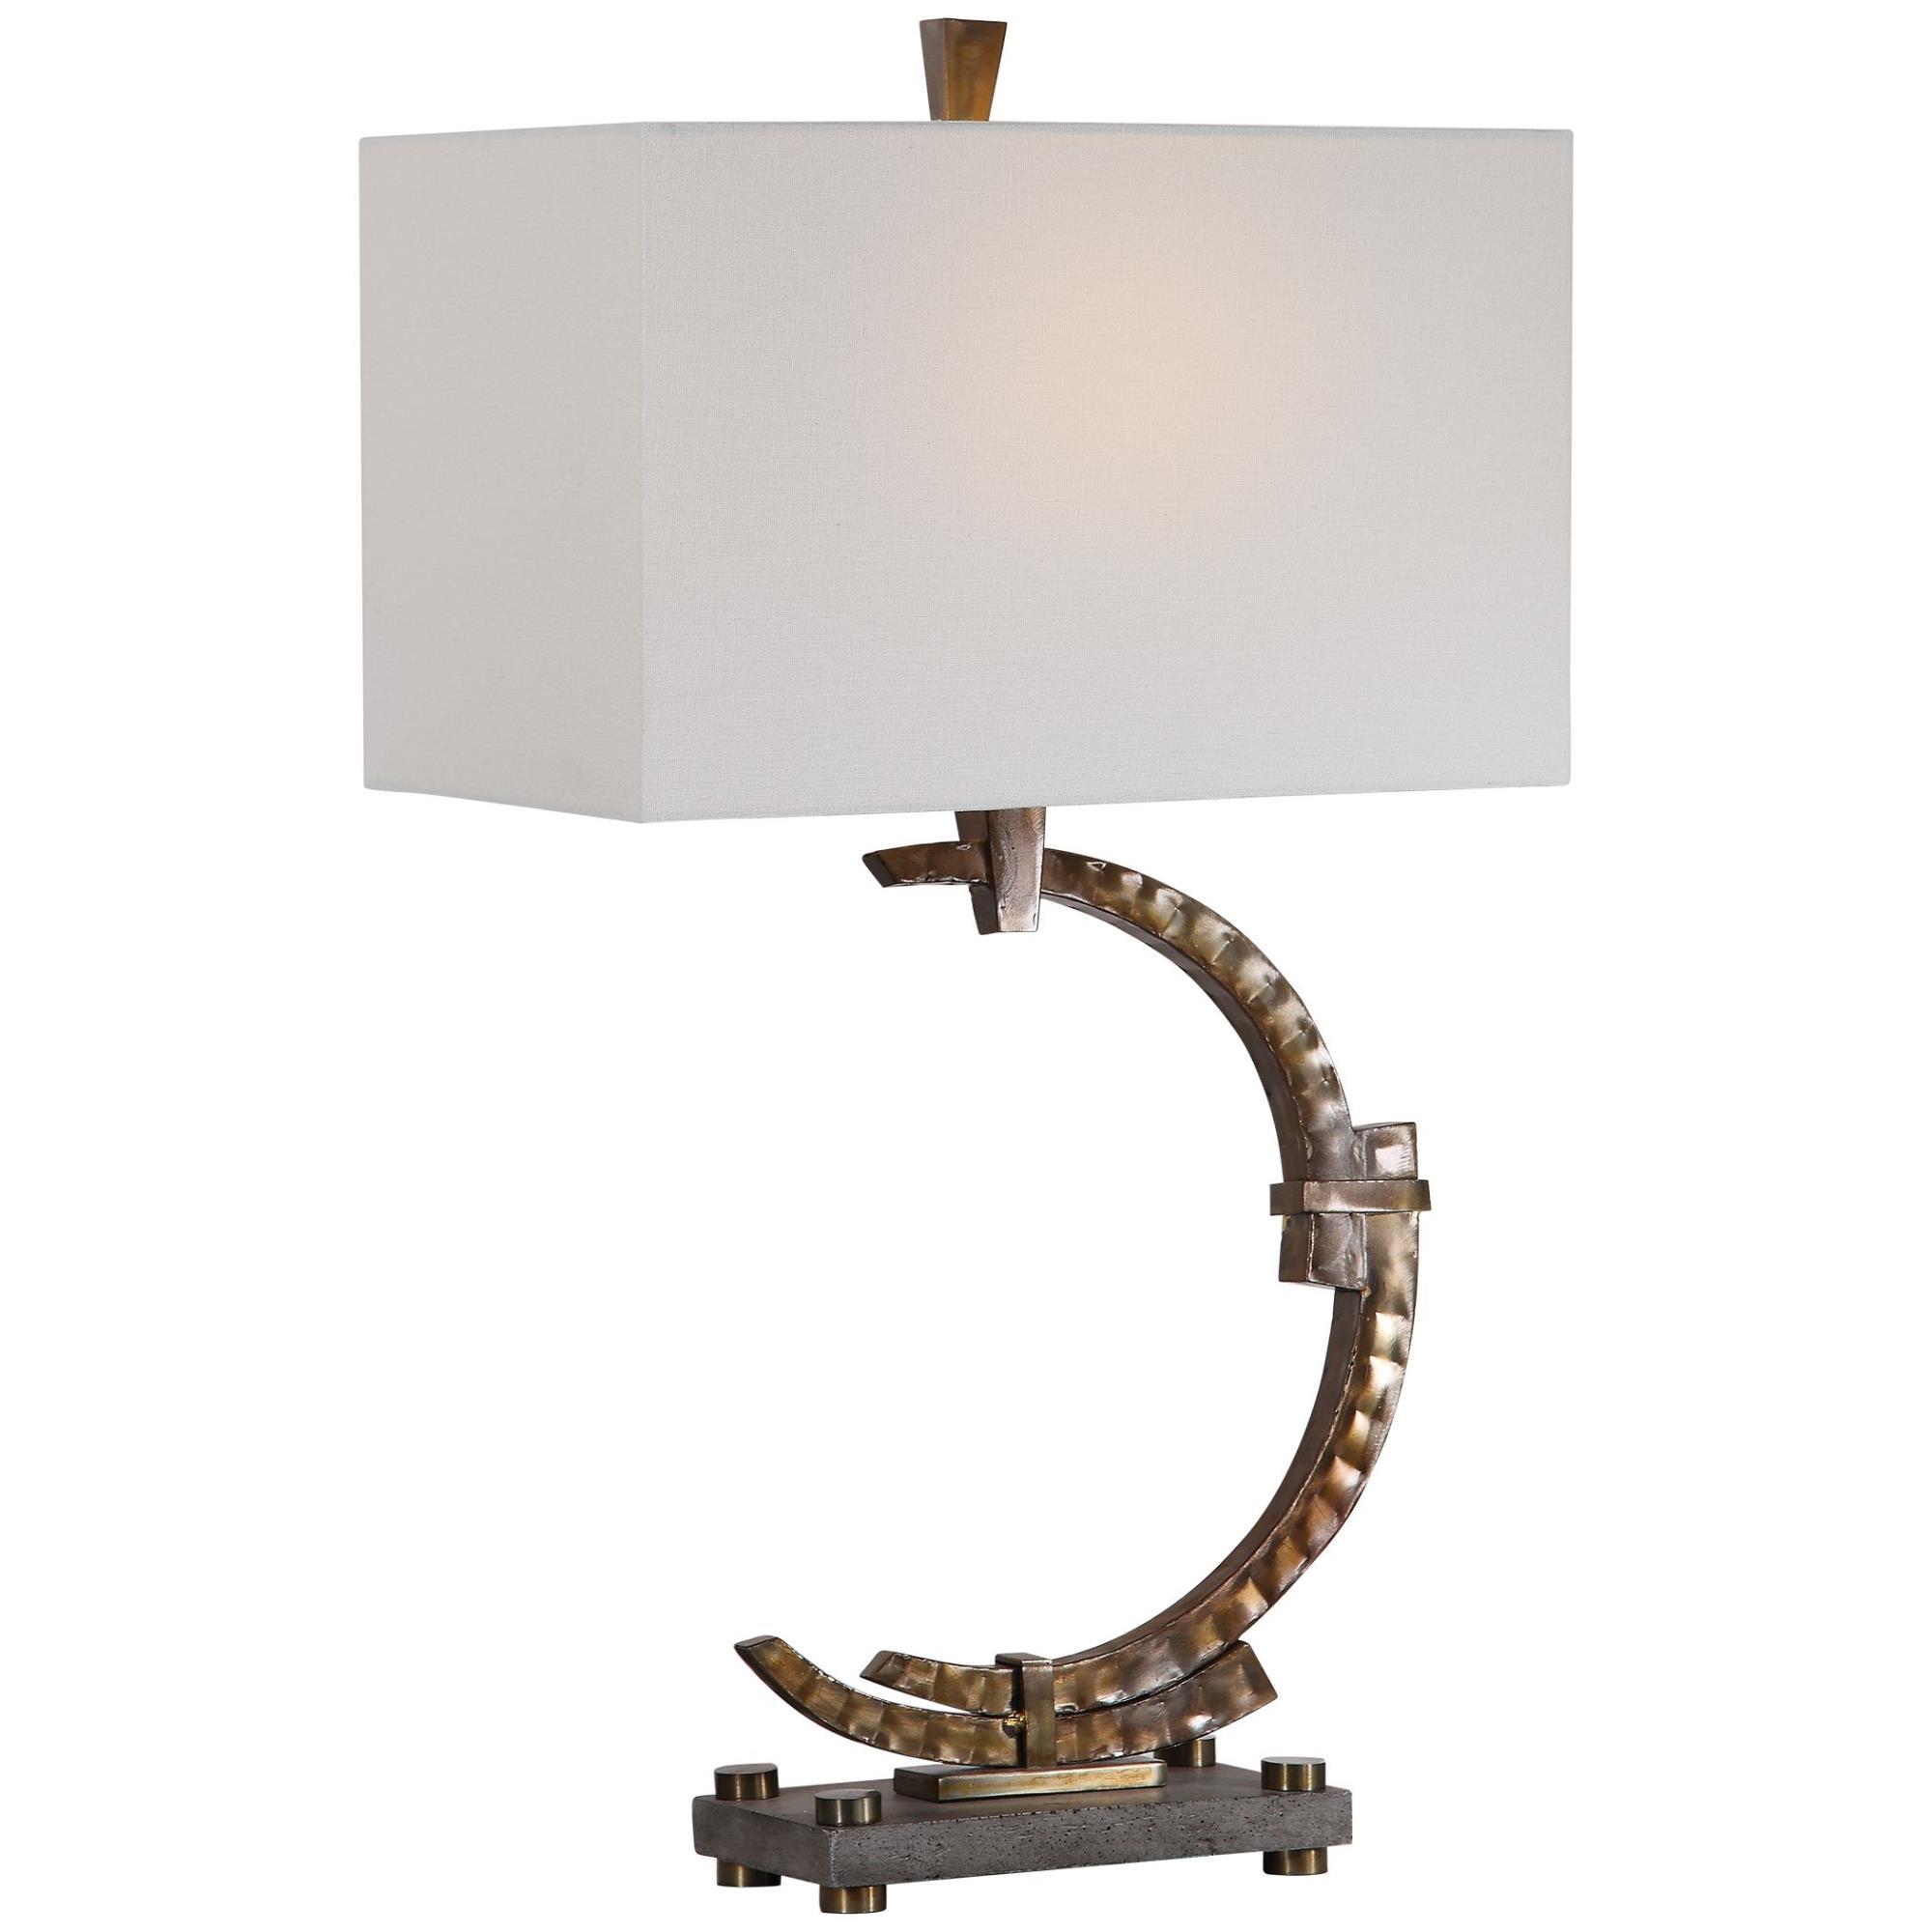 Carolyn Kinder Atria 28 Inch Table Lamp